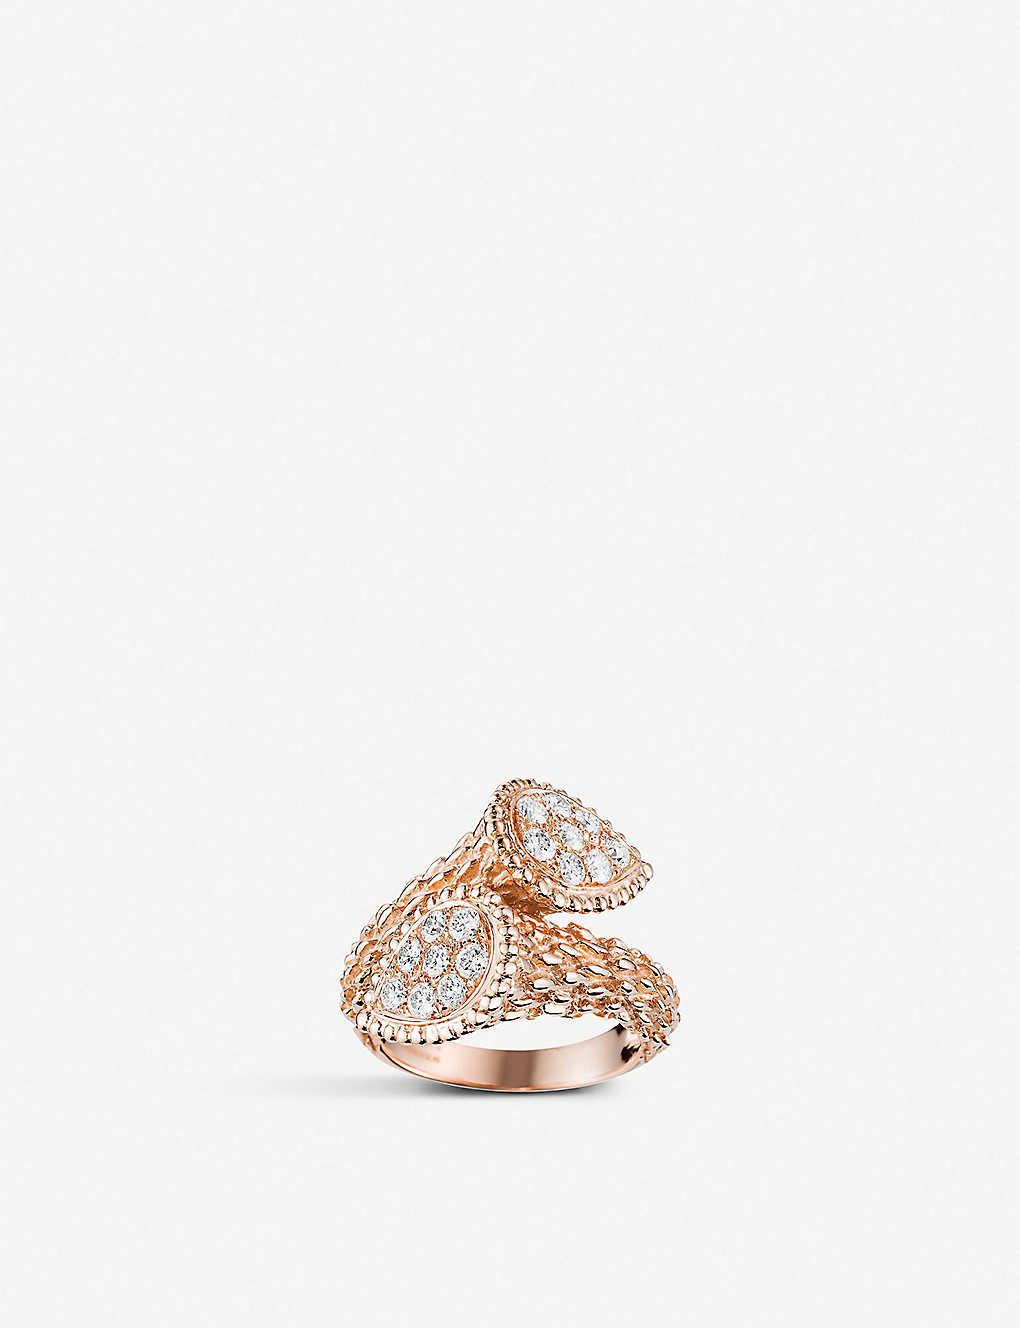 050694c2eea0b3 BOUCHERON - Serpent Bohème Toi et Moi 18ct rose gold and diamond ...